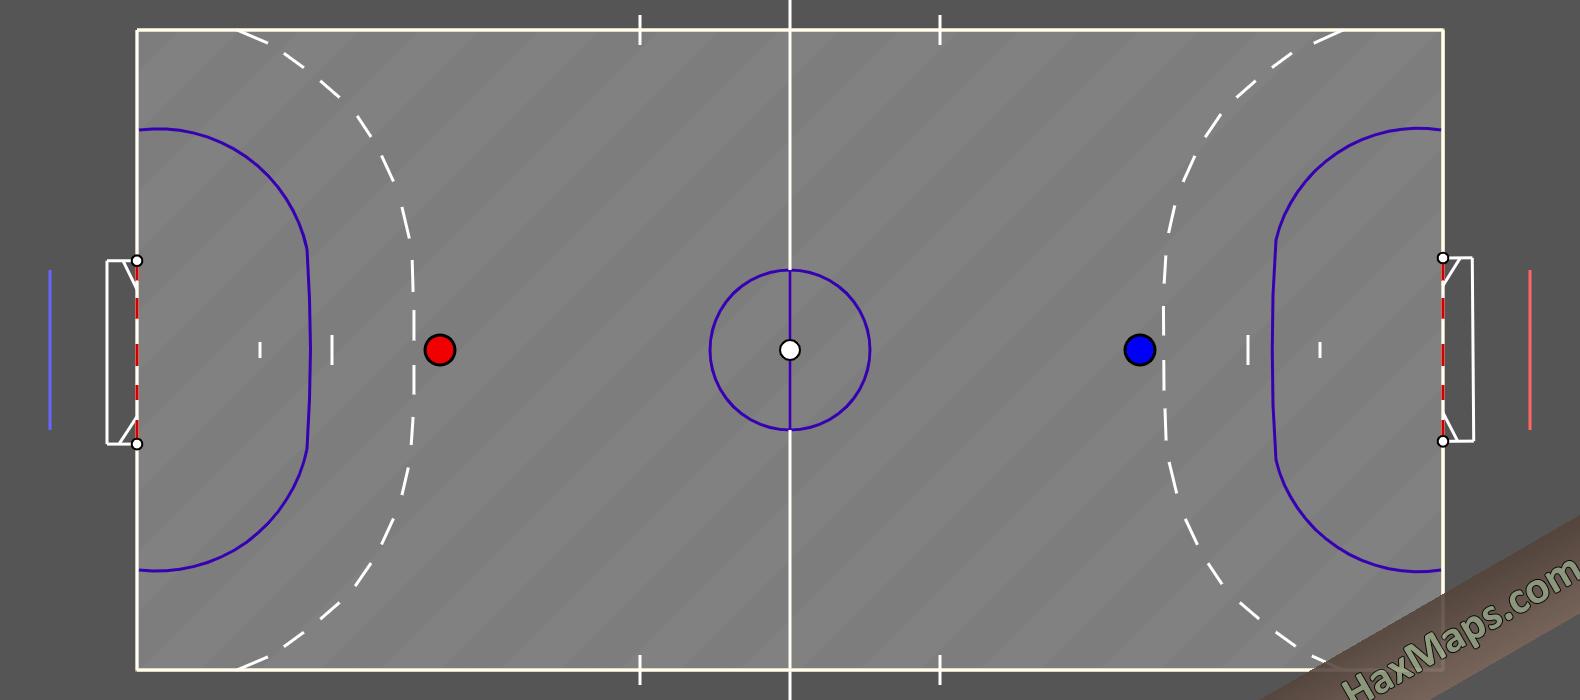 hax ball maps | Real Handball GLH